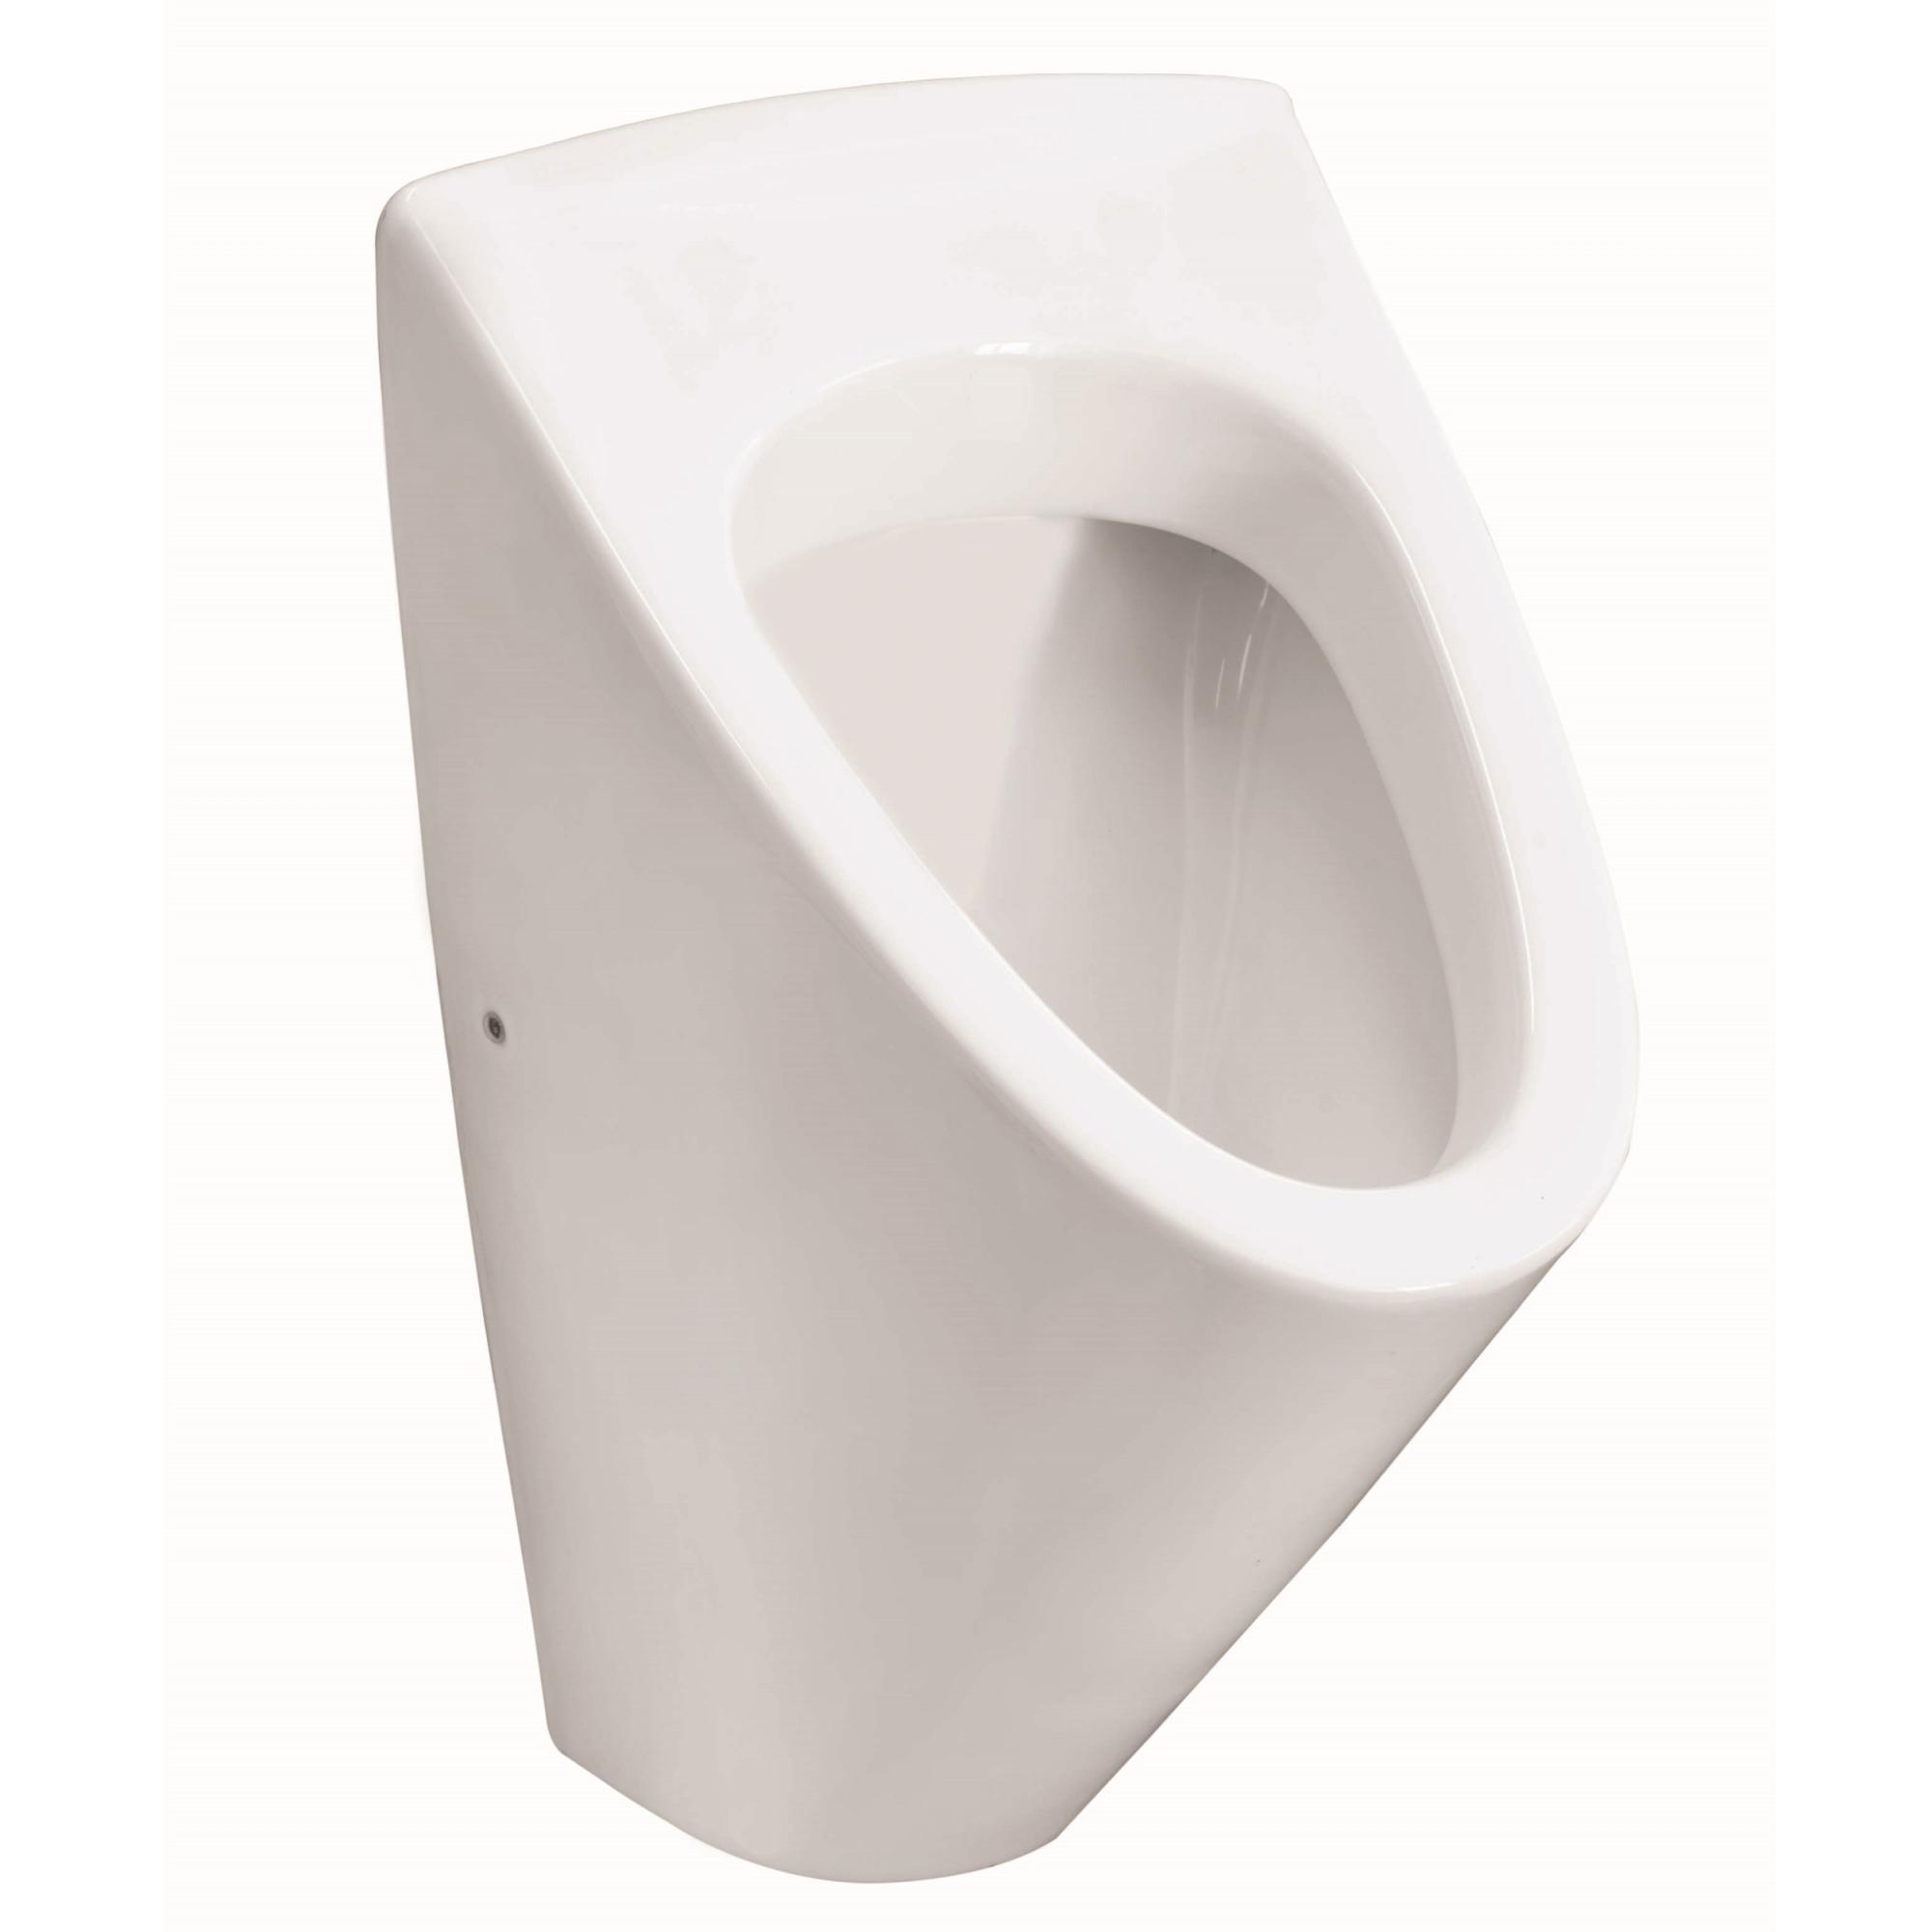 Vitra Ceramic China Urinal Exposed Auto Cistern